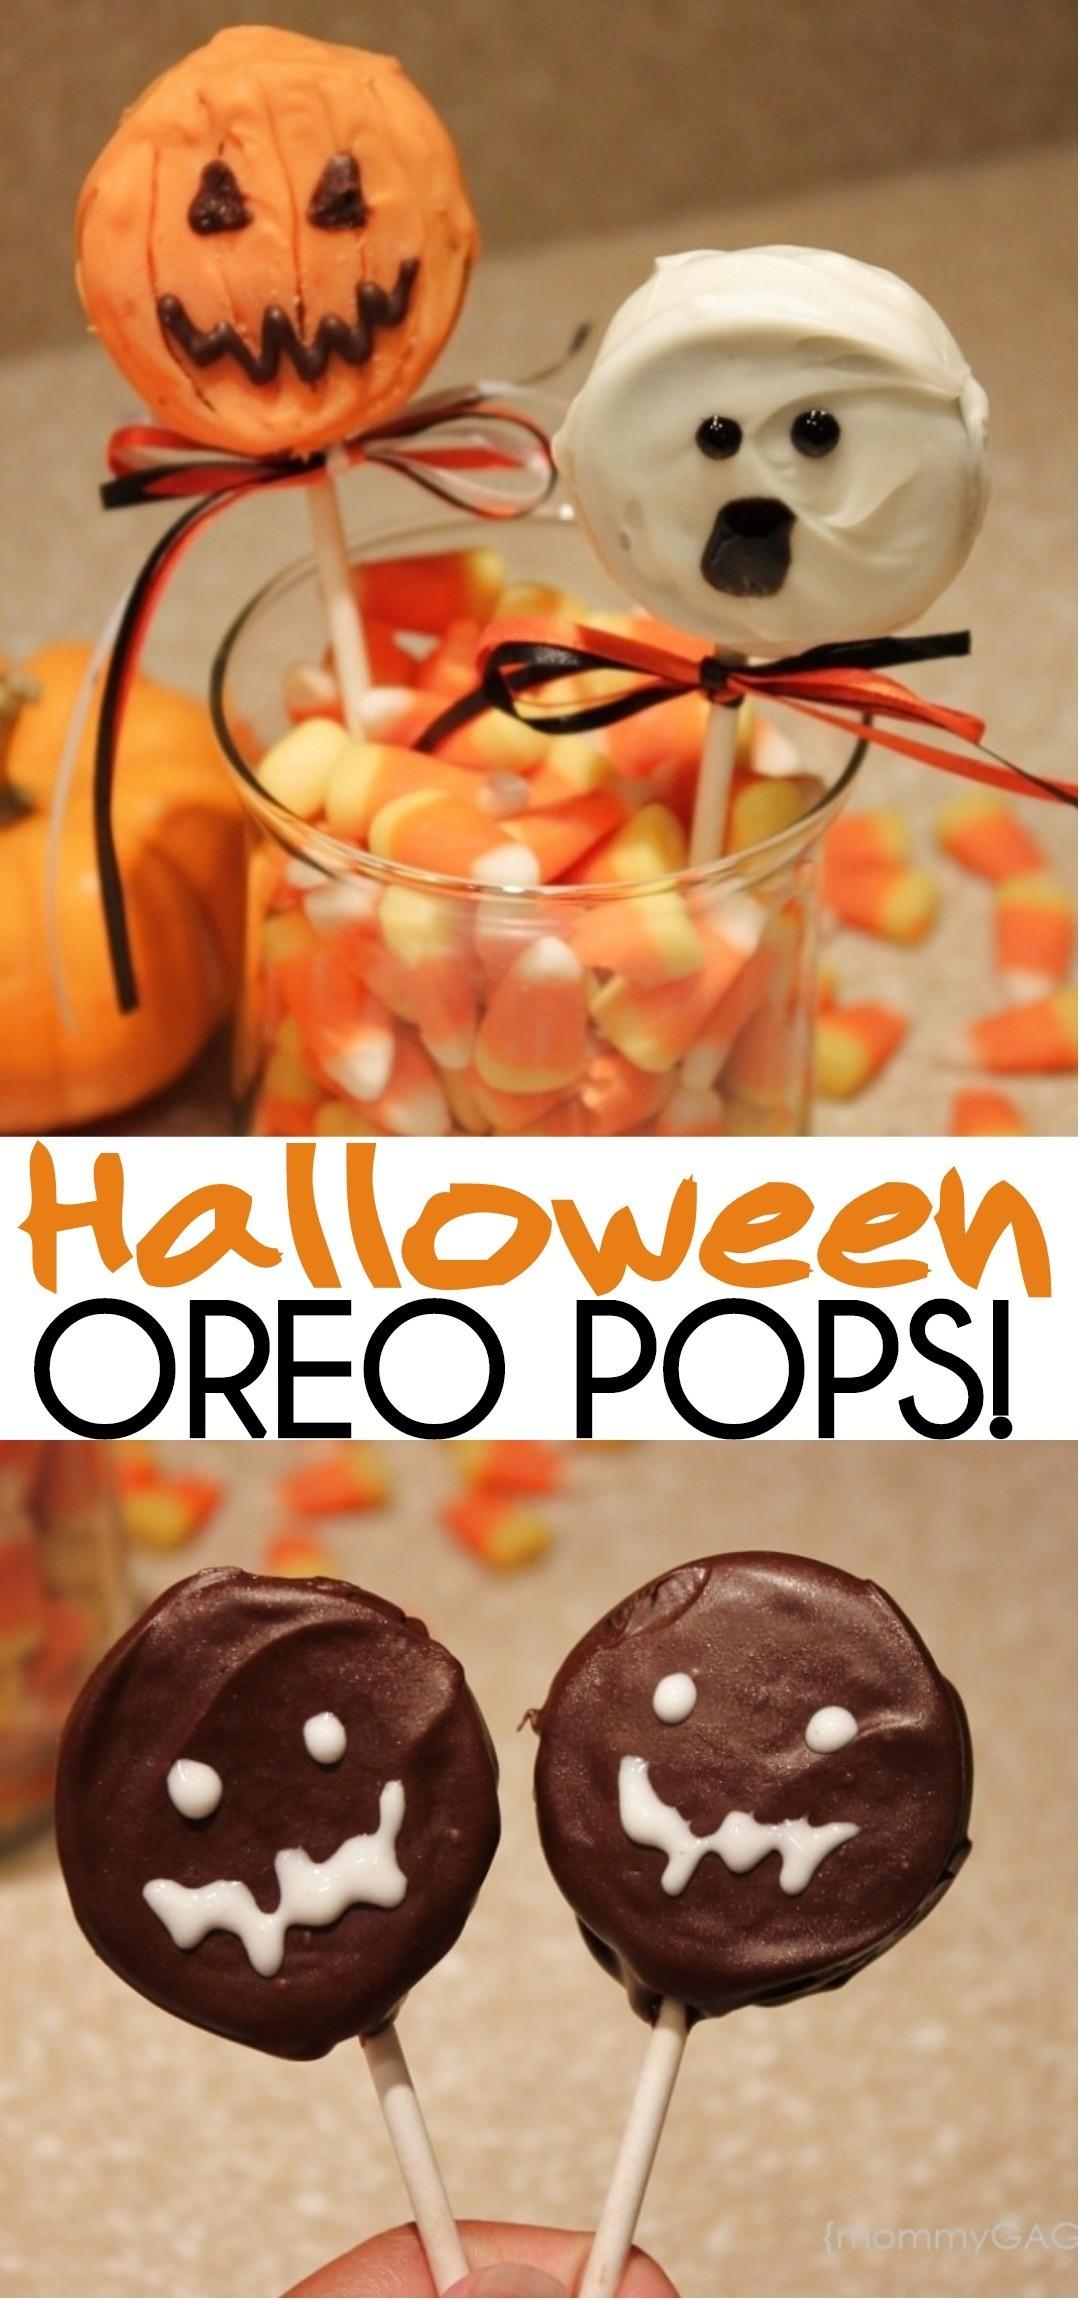 Cute Halloween Makeup Ideas: Cute Halloween Oreo Pops: Pumpkins, Ghosts And Monsters